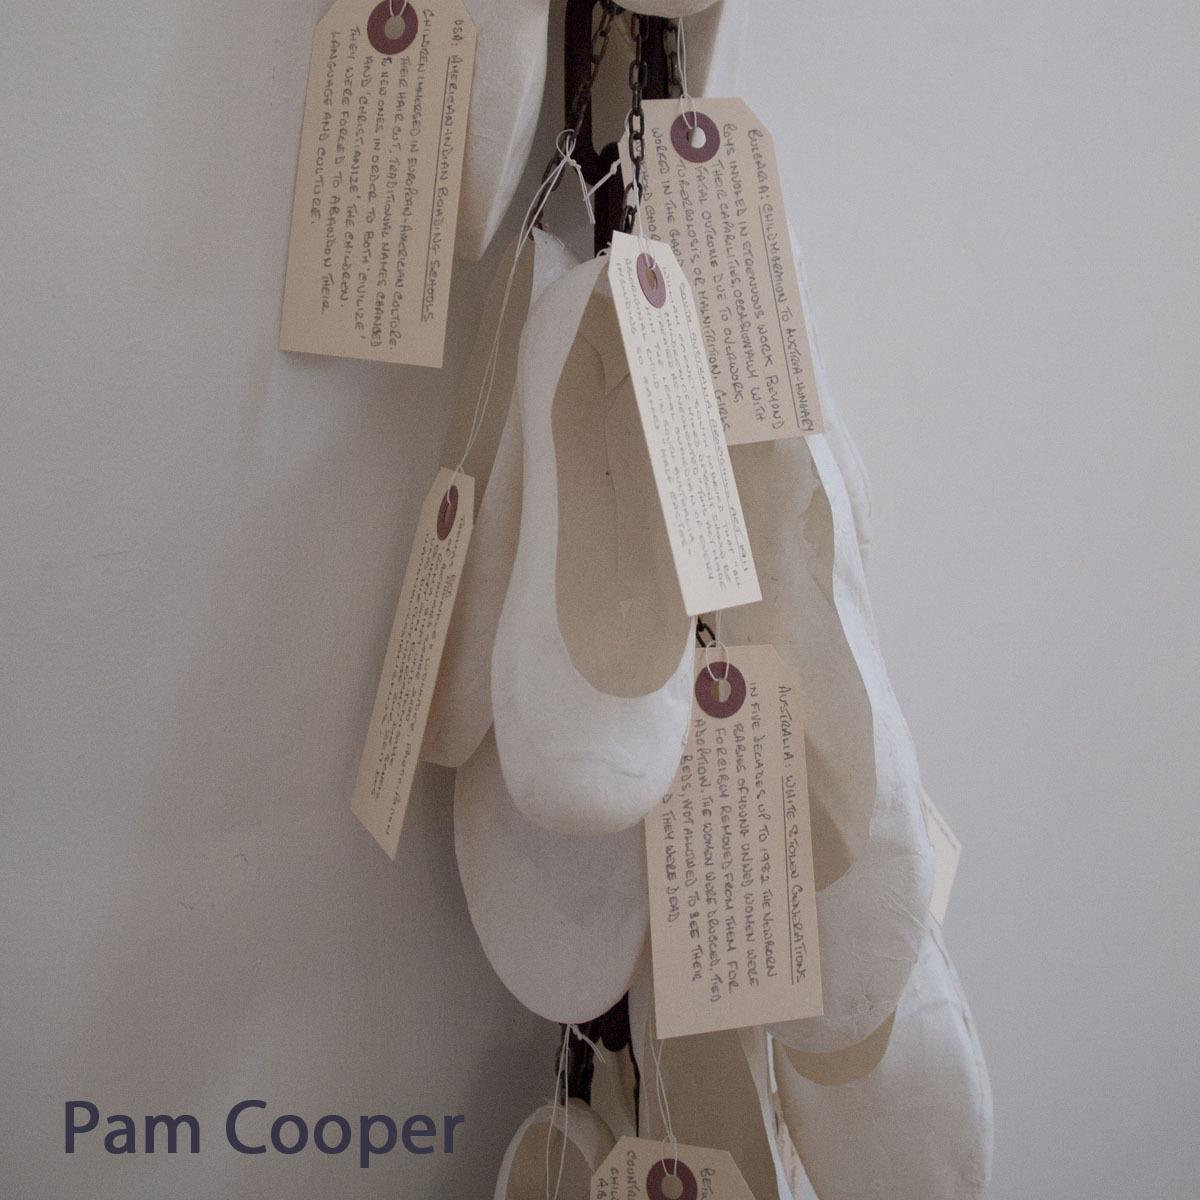 Pam Cooper: Stolen (large view)